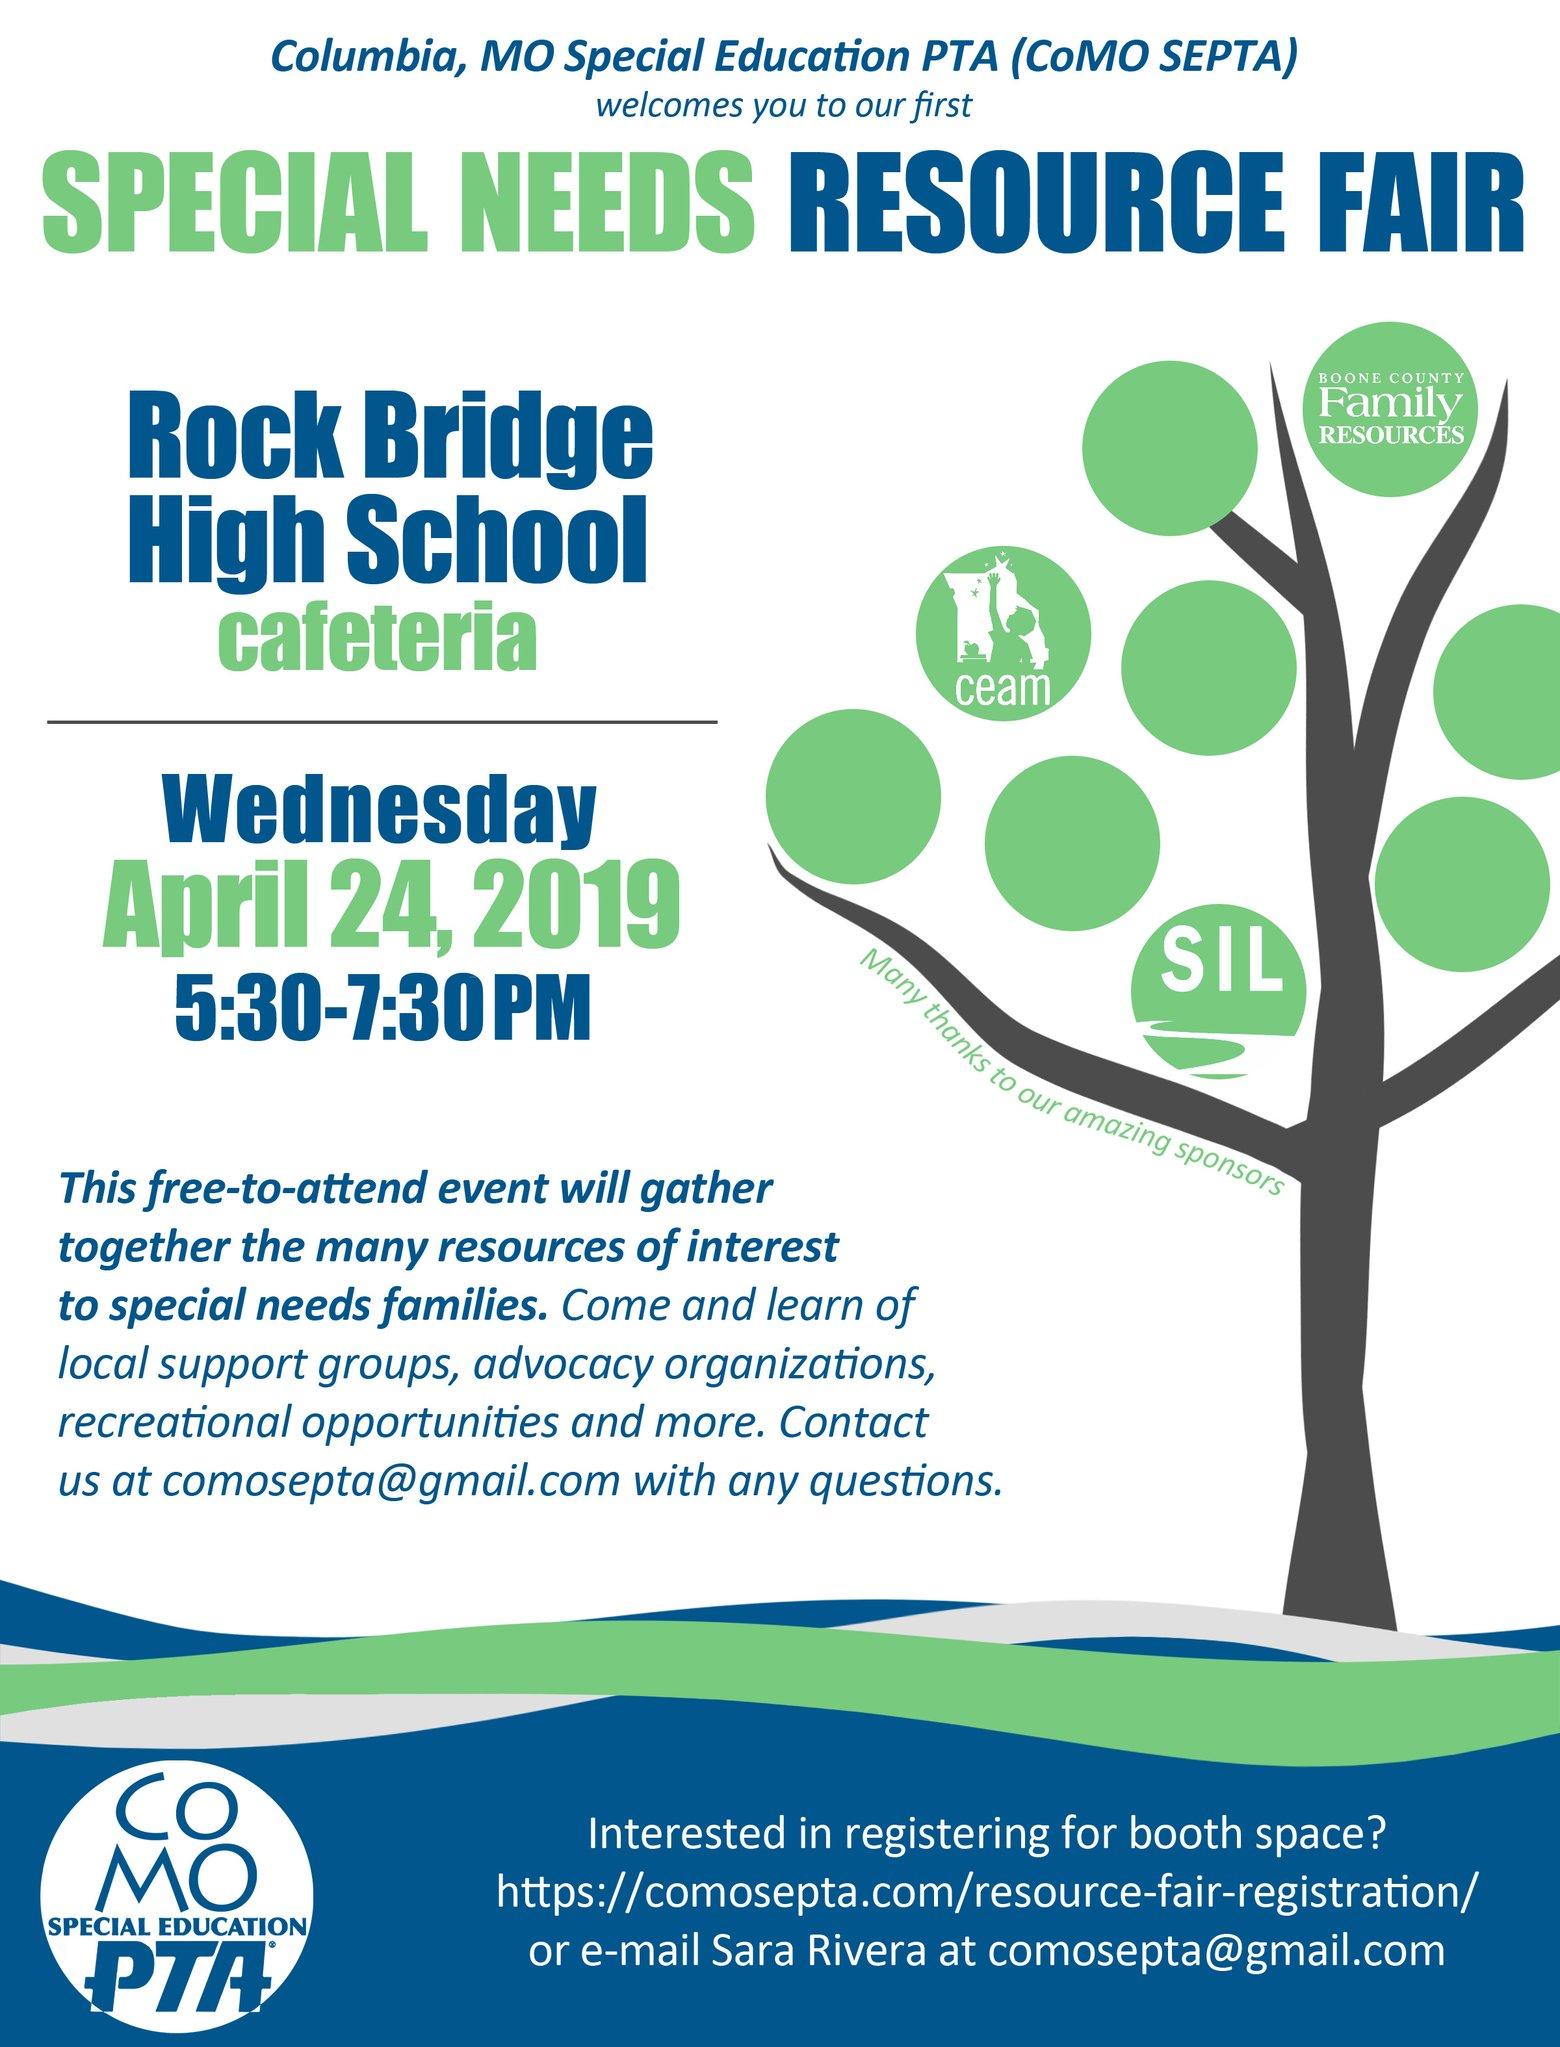 CoMO SEPTA Resource Fair @ Rock Bridge High School cafeteria